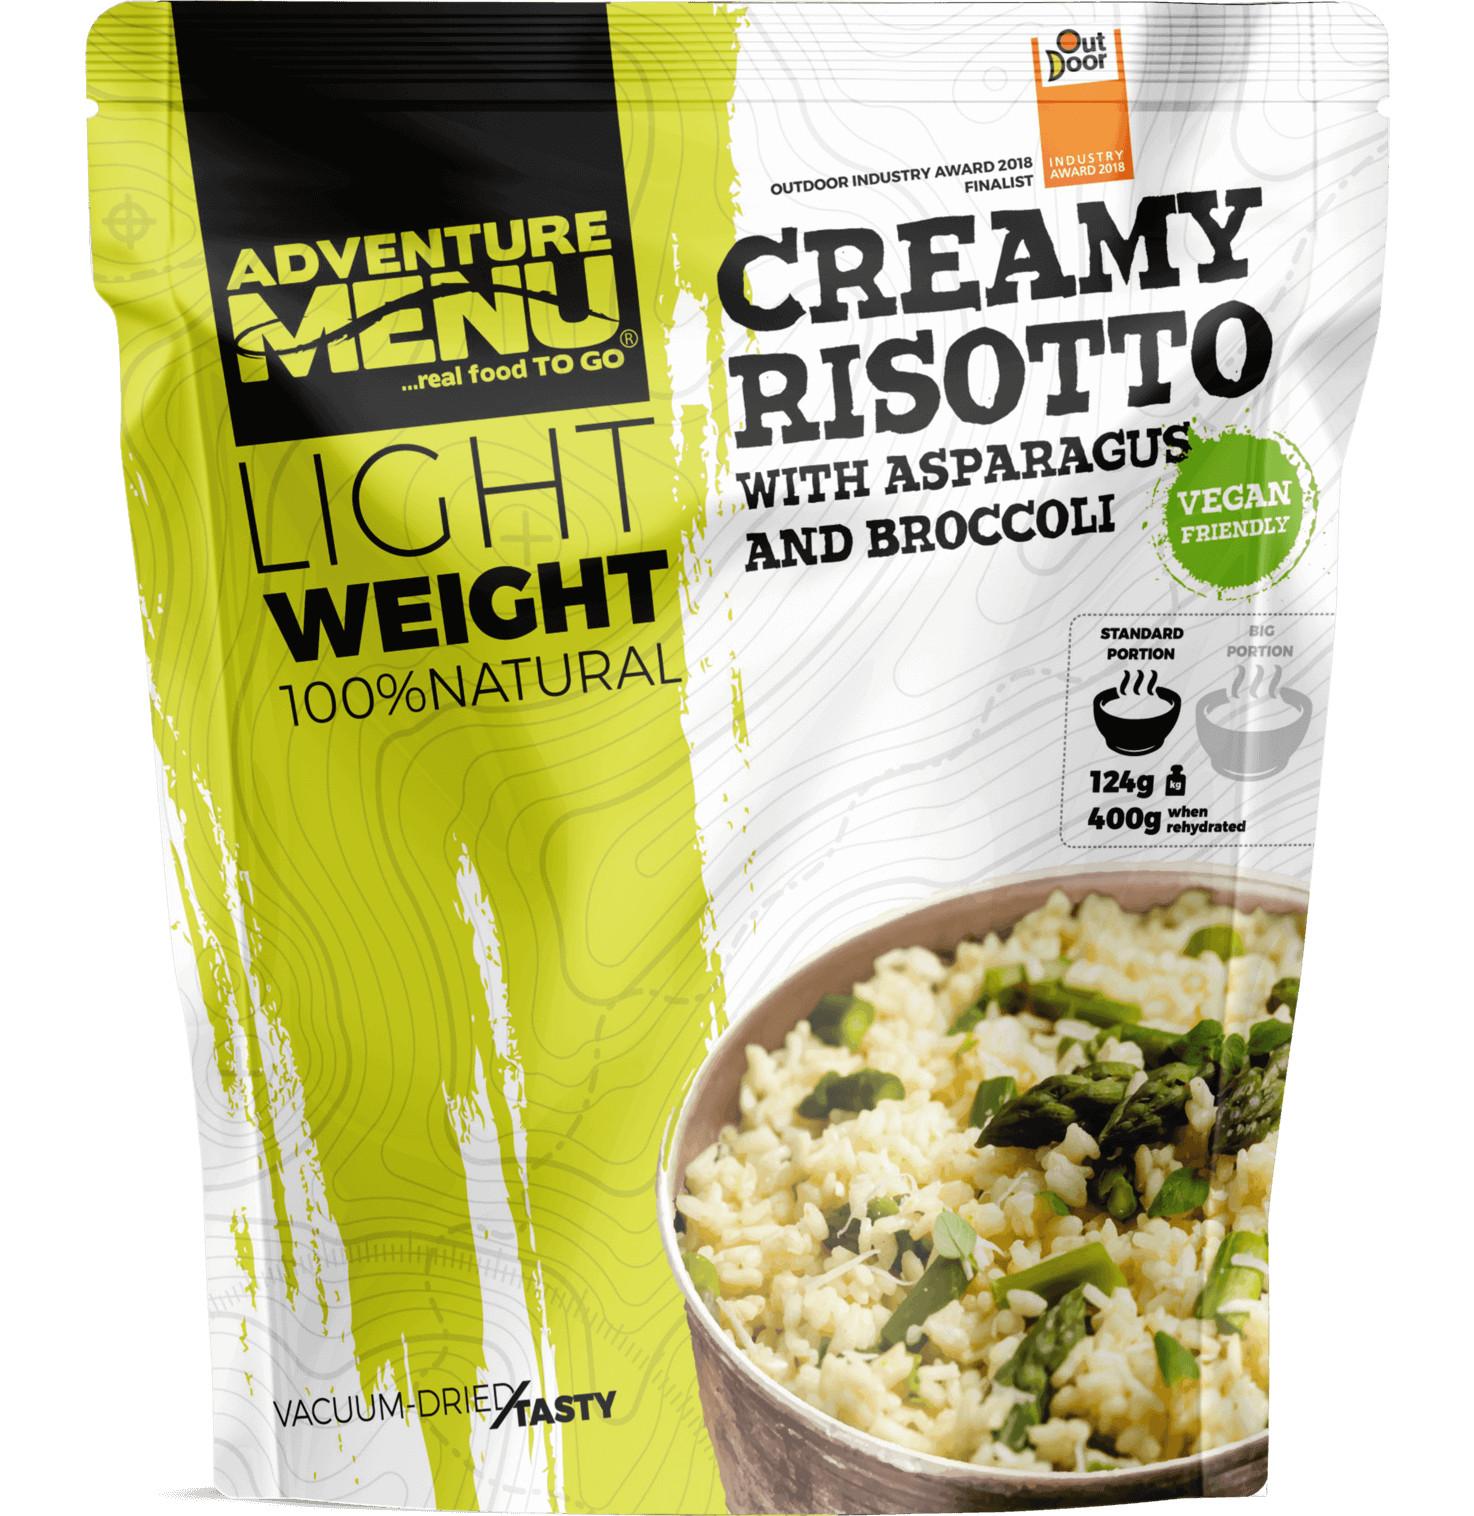 Adventure Menu Krémové rizoto s chřestem a brokolicí (hotová strava) VEGAN 400g LIGHTWEIGHT